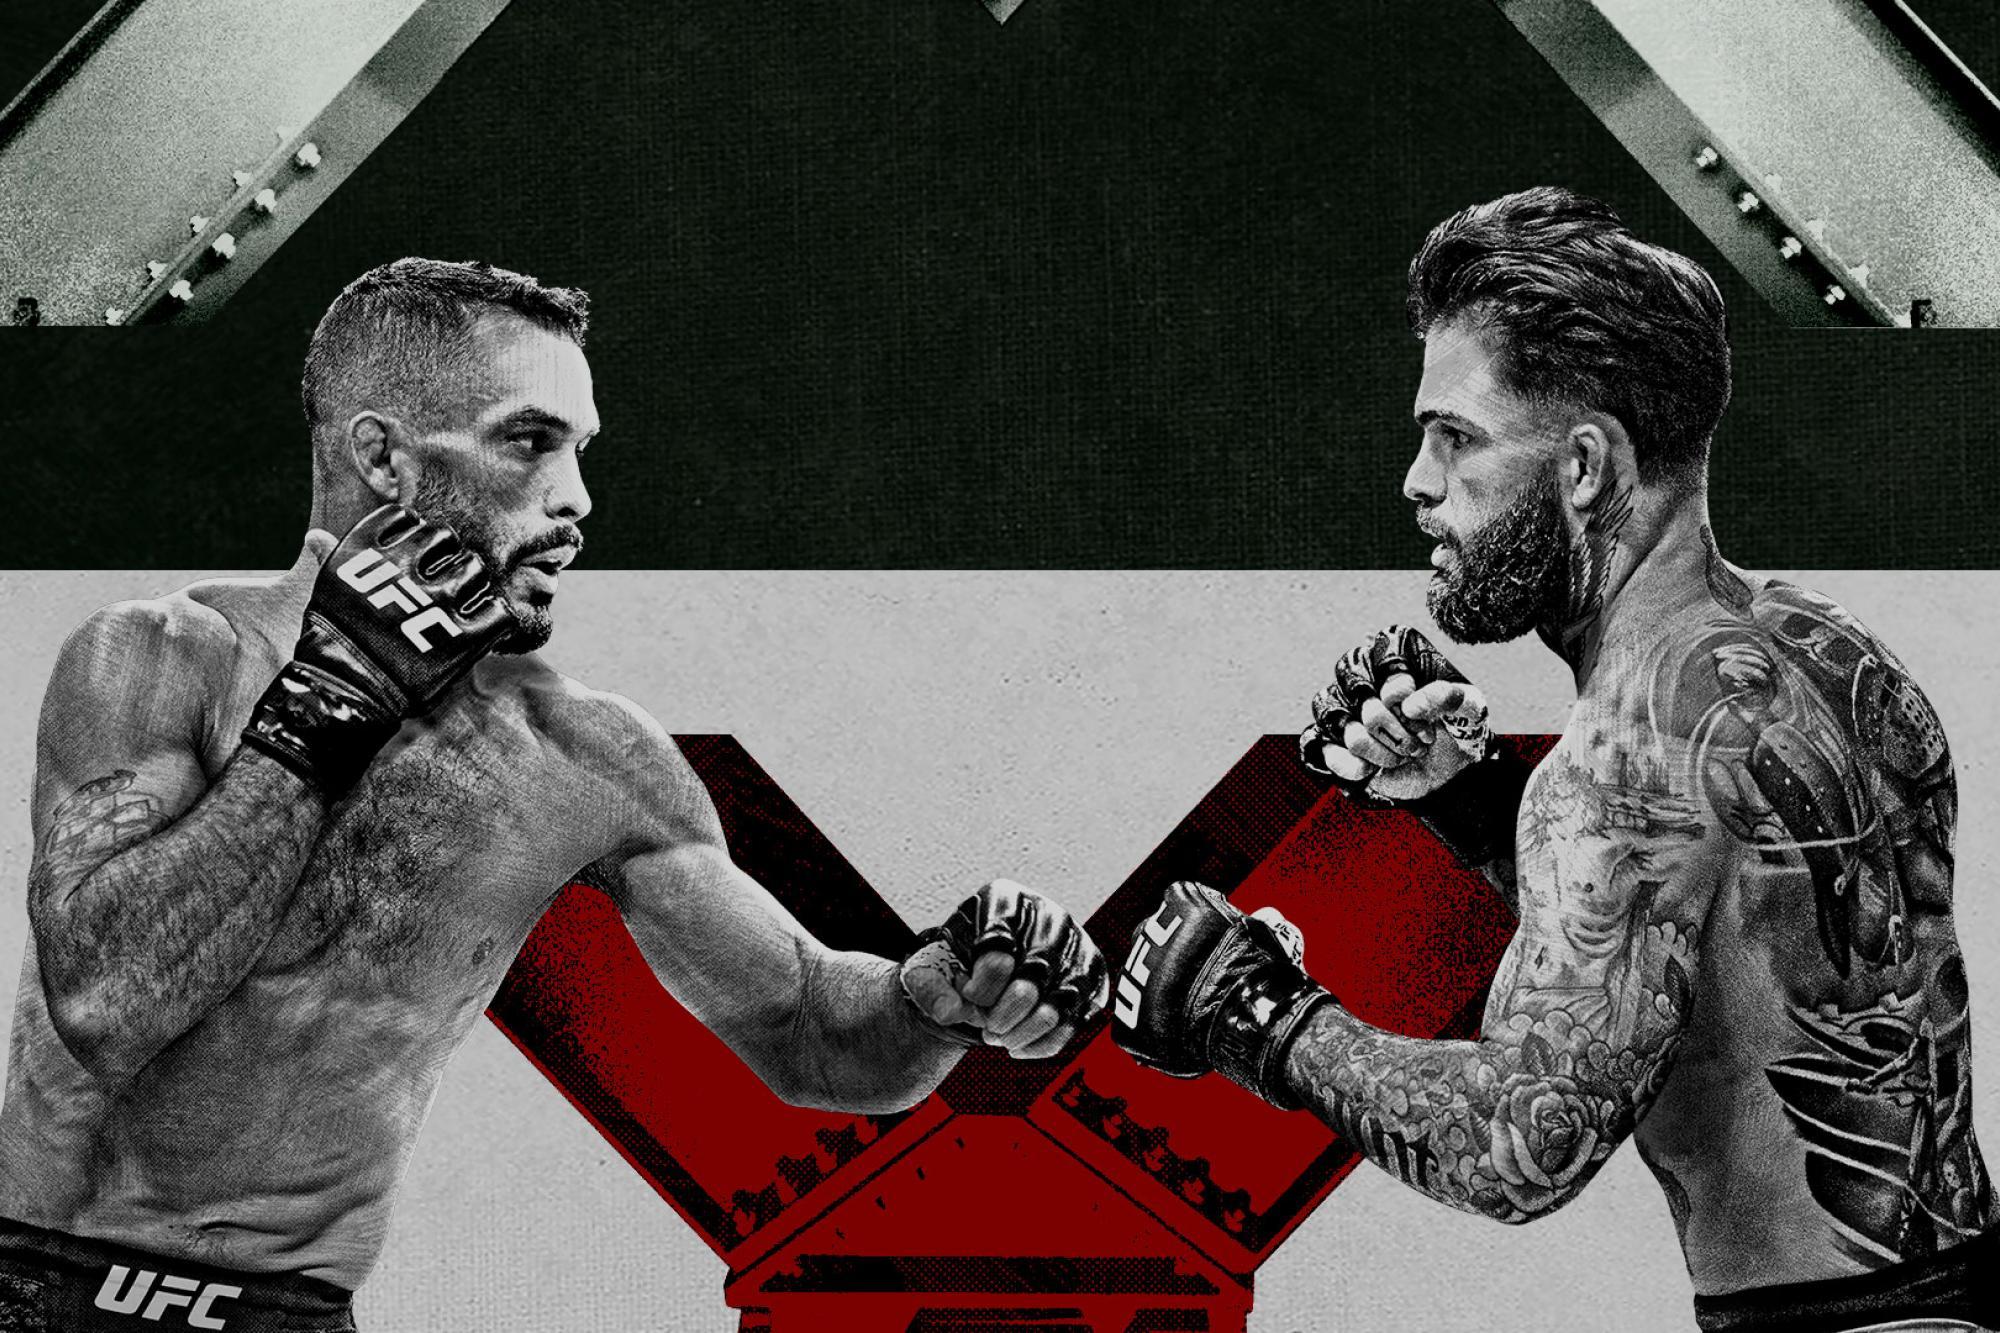 UFC Fight Night: Font vs Garbrandt Results, Winner Interviews, Fight Highlights and More